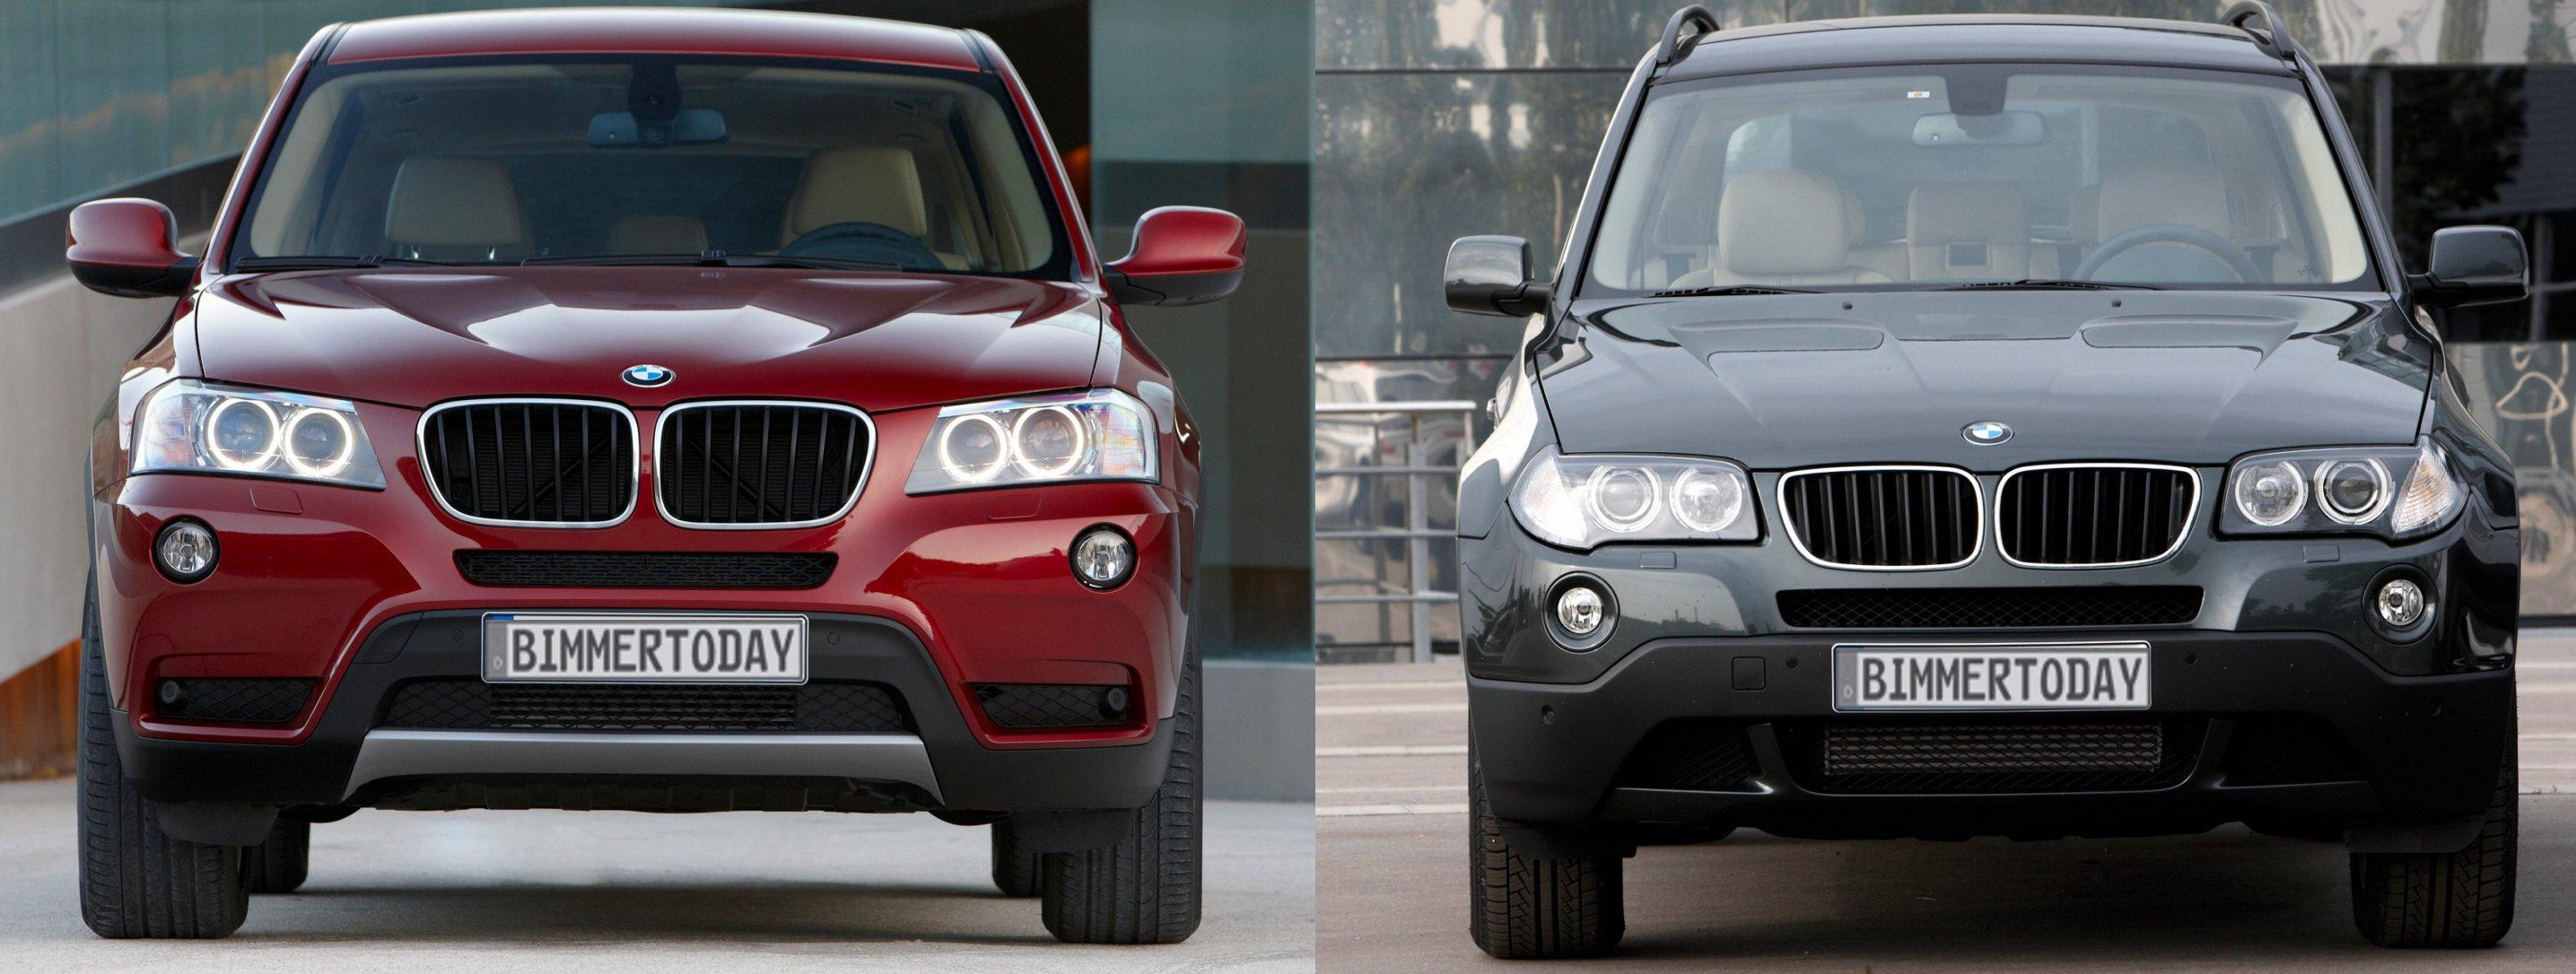 BMW X3 II (F25) Restyling 2014 - now SUV 5 door #6